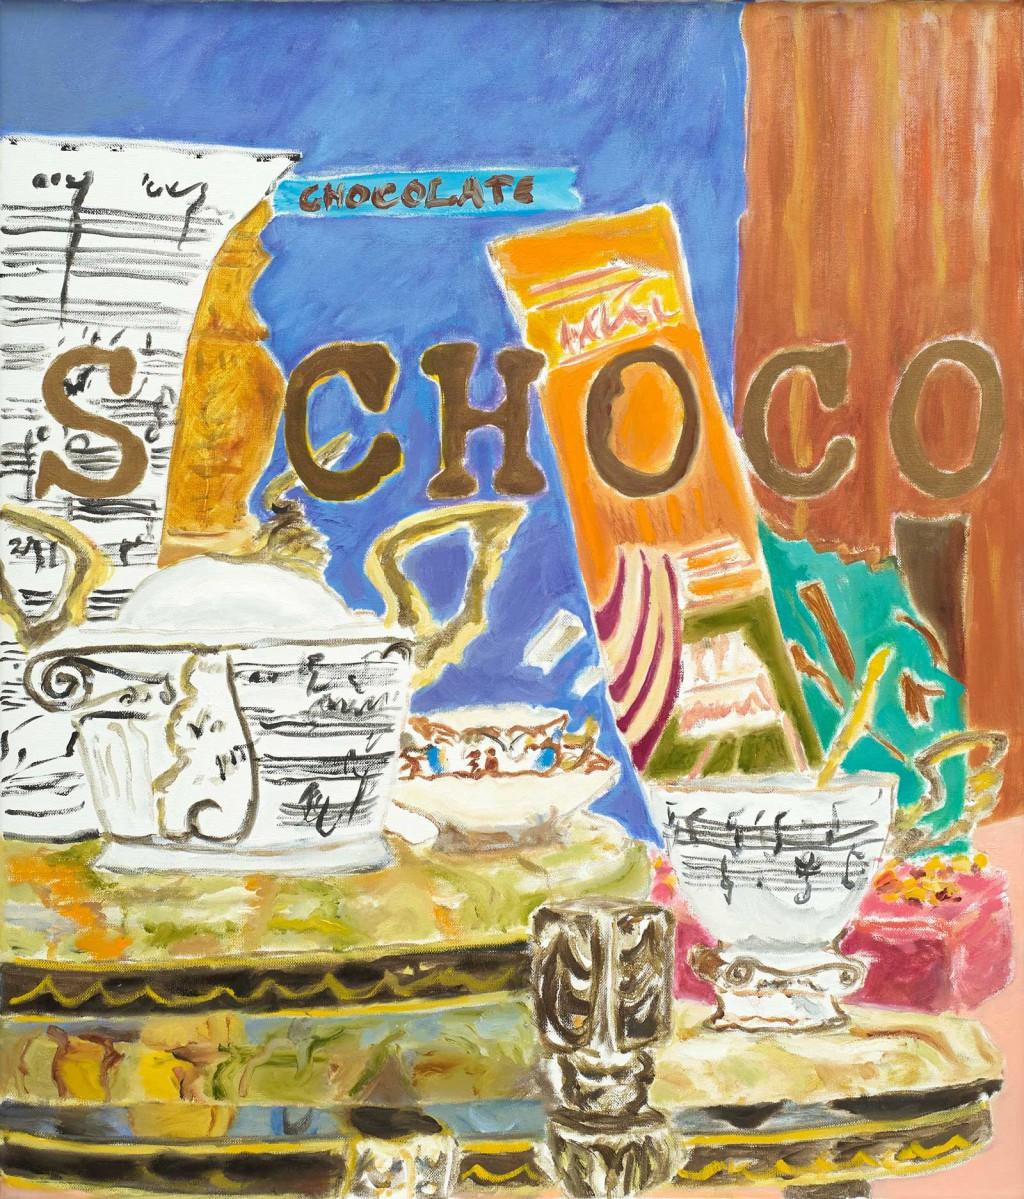 S Choco  2019  Oel auf Leinwand  70 x 60 cm/28 x 24 in